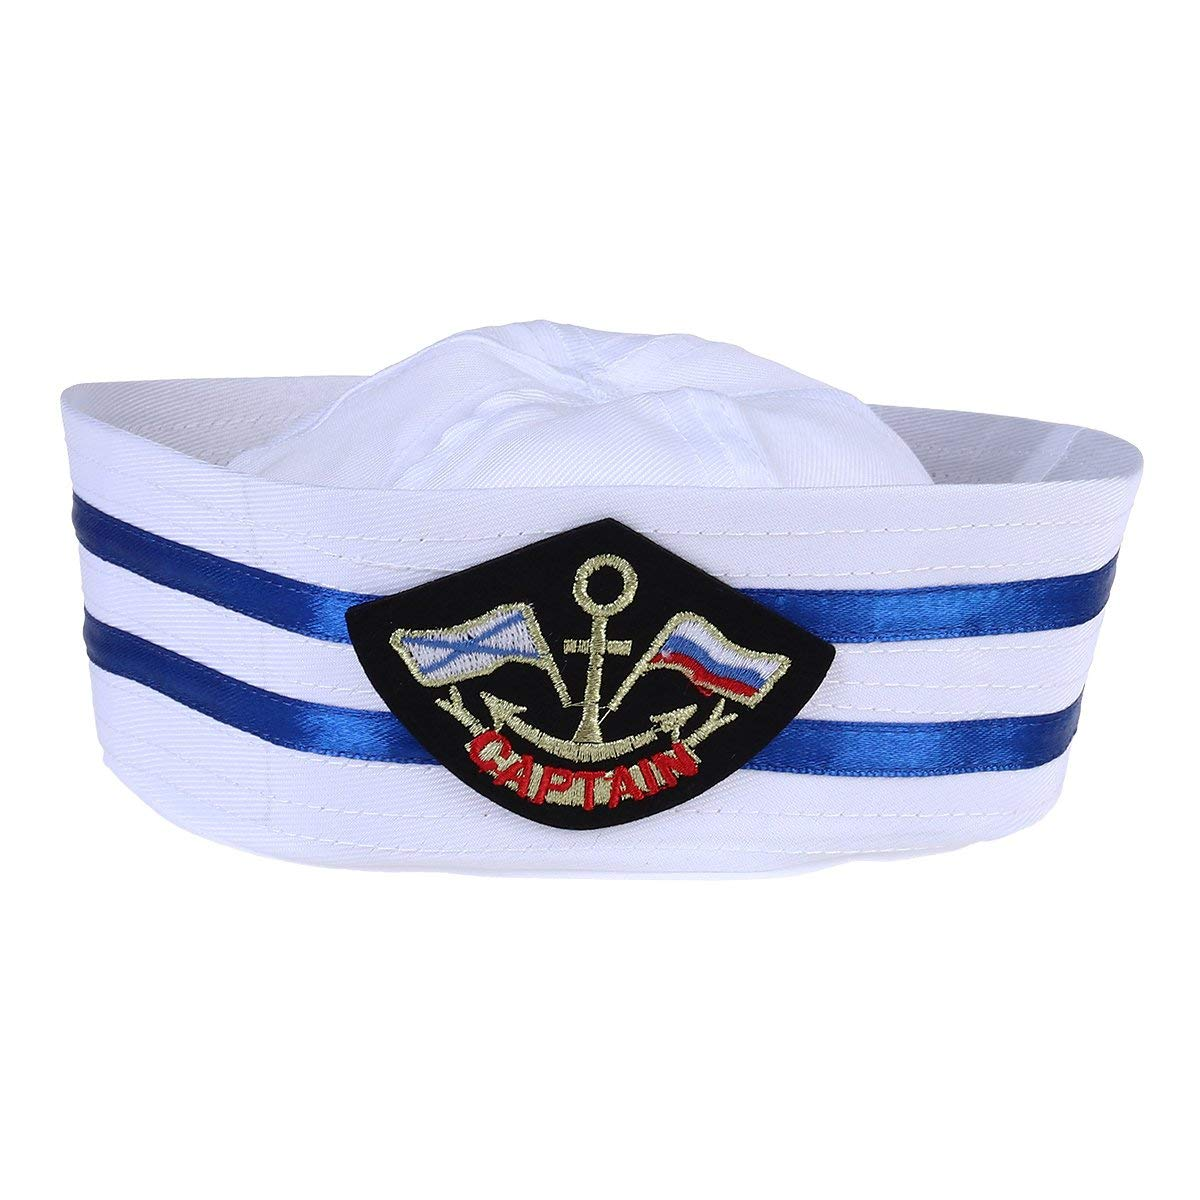 95a5fe9f5111b Get Quotations · BESTOYARD Captain Hat Cap Sailor Hat Skipper Navy Marine  Cap Kids Yacht Cap Hat For Costume